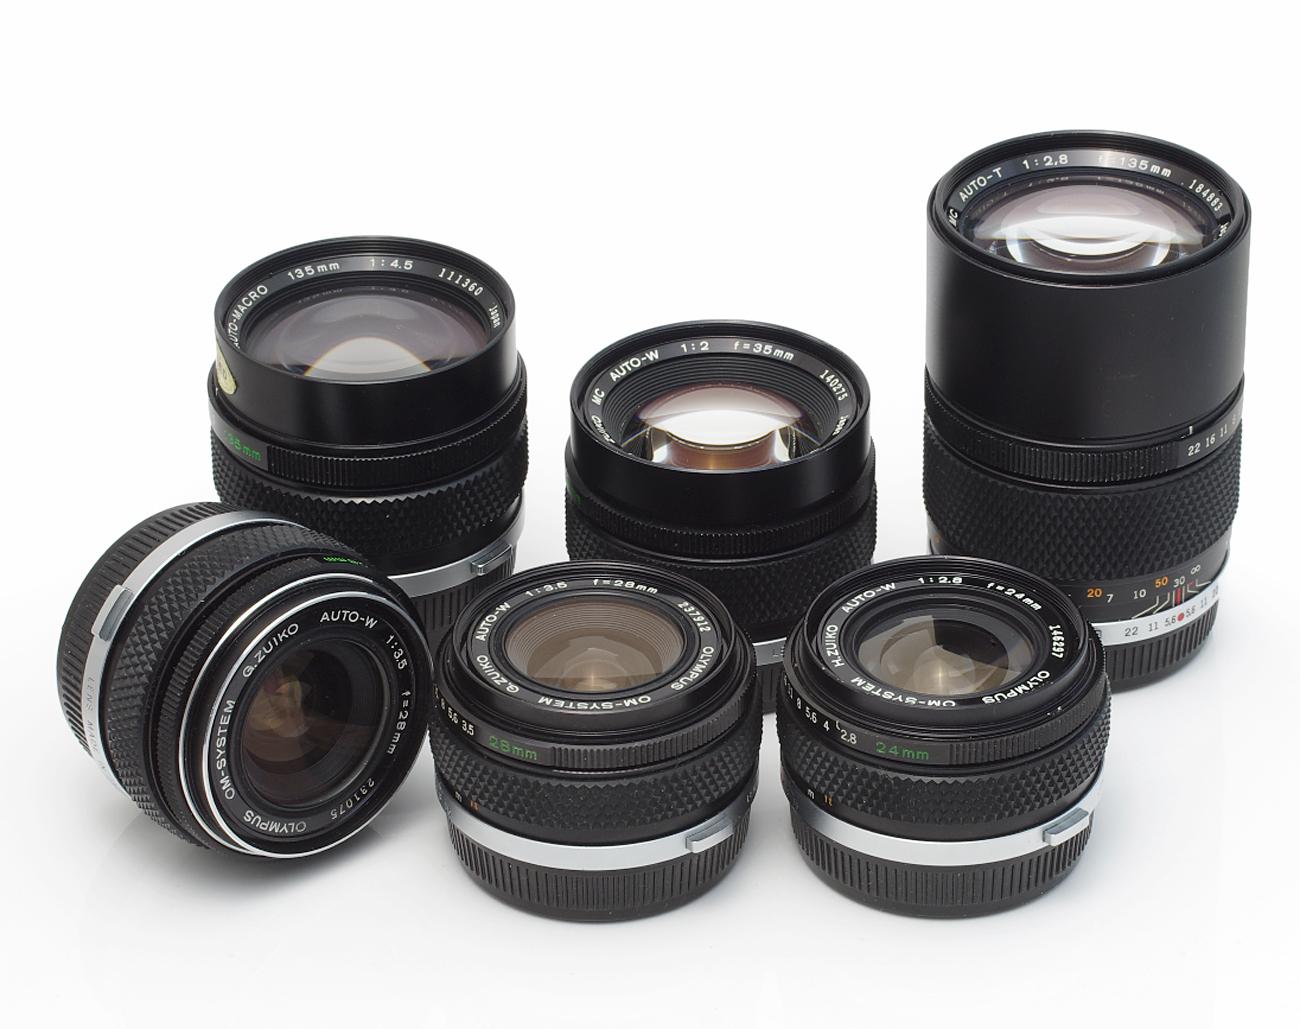 Lot-Olympus-Lenses-28mm-50mm-135mm-180mm-200mm-85-250mm-300mm Indexbild 3